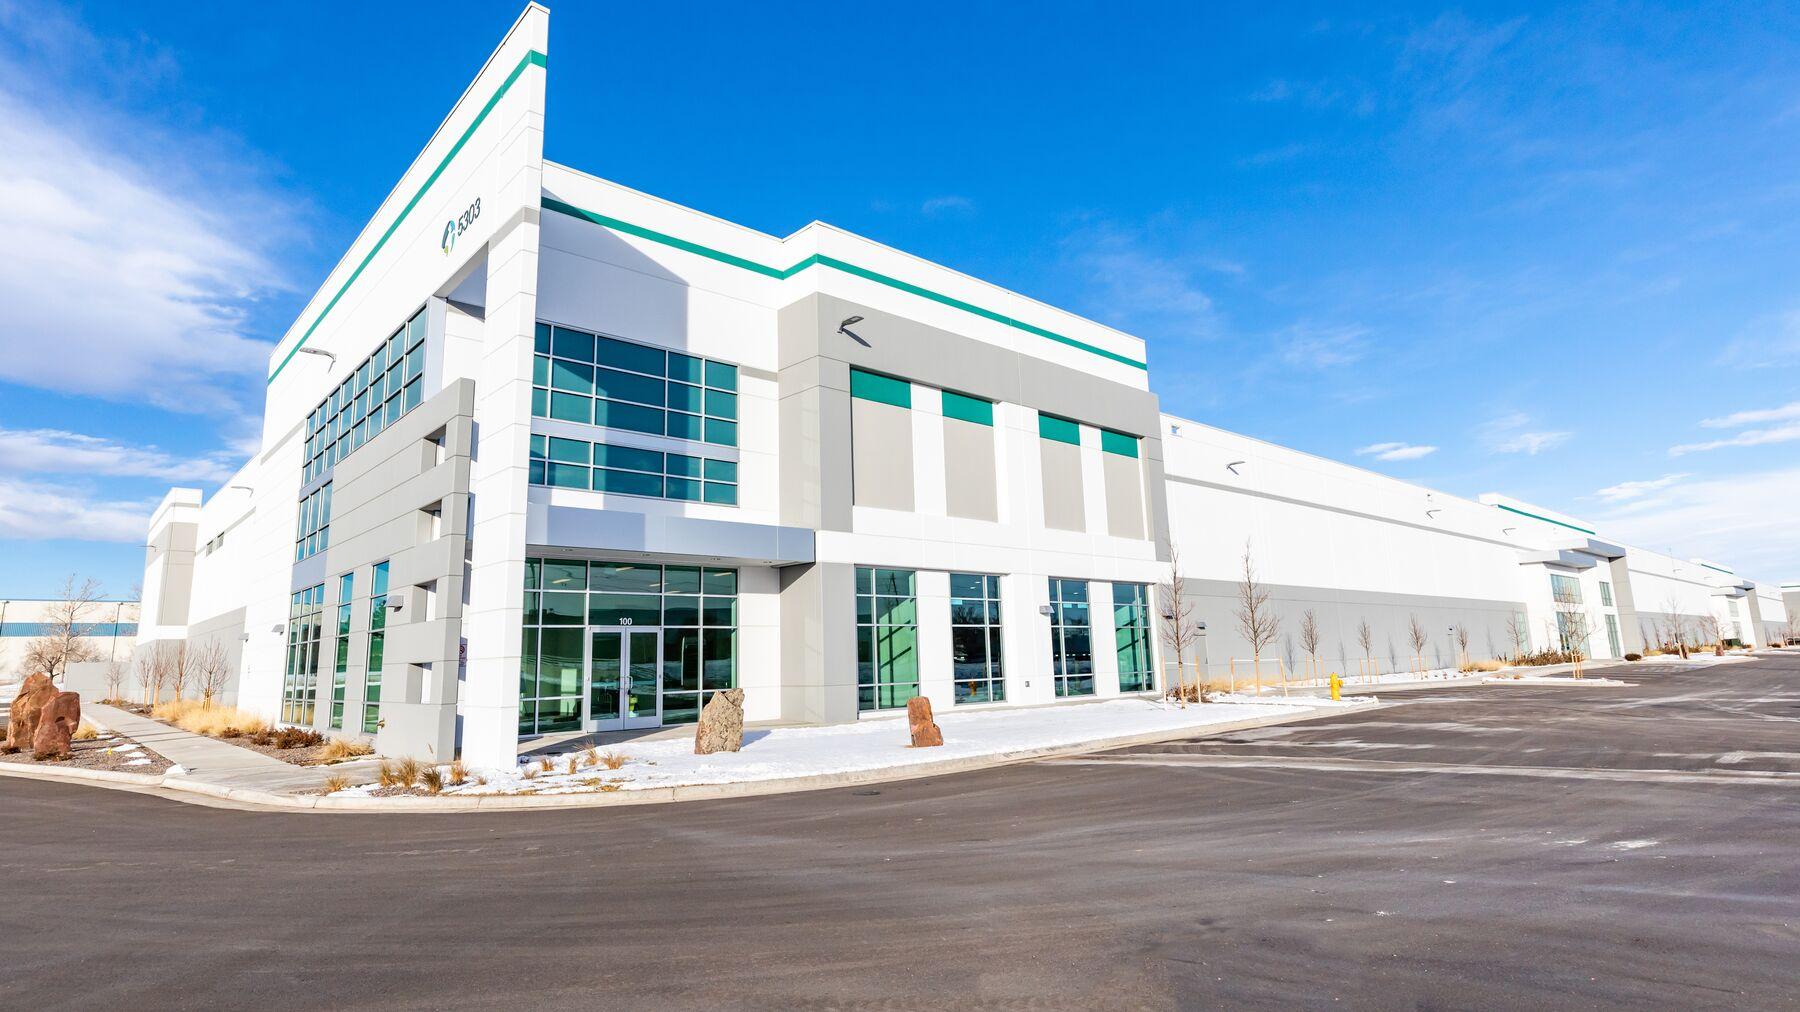 DPM-Prologis-Business-Center-North-poi-005.jpg